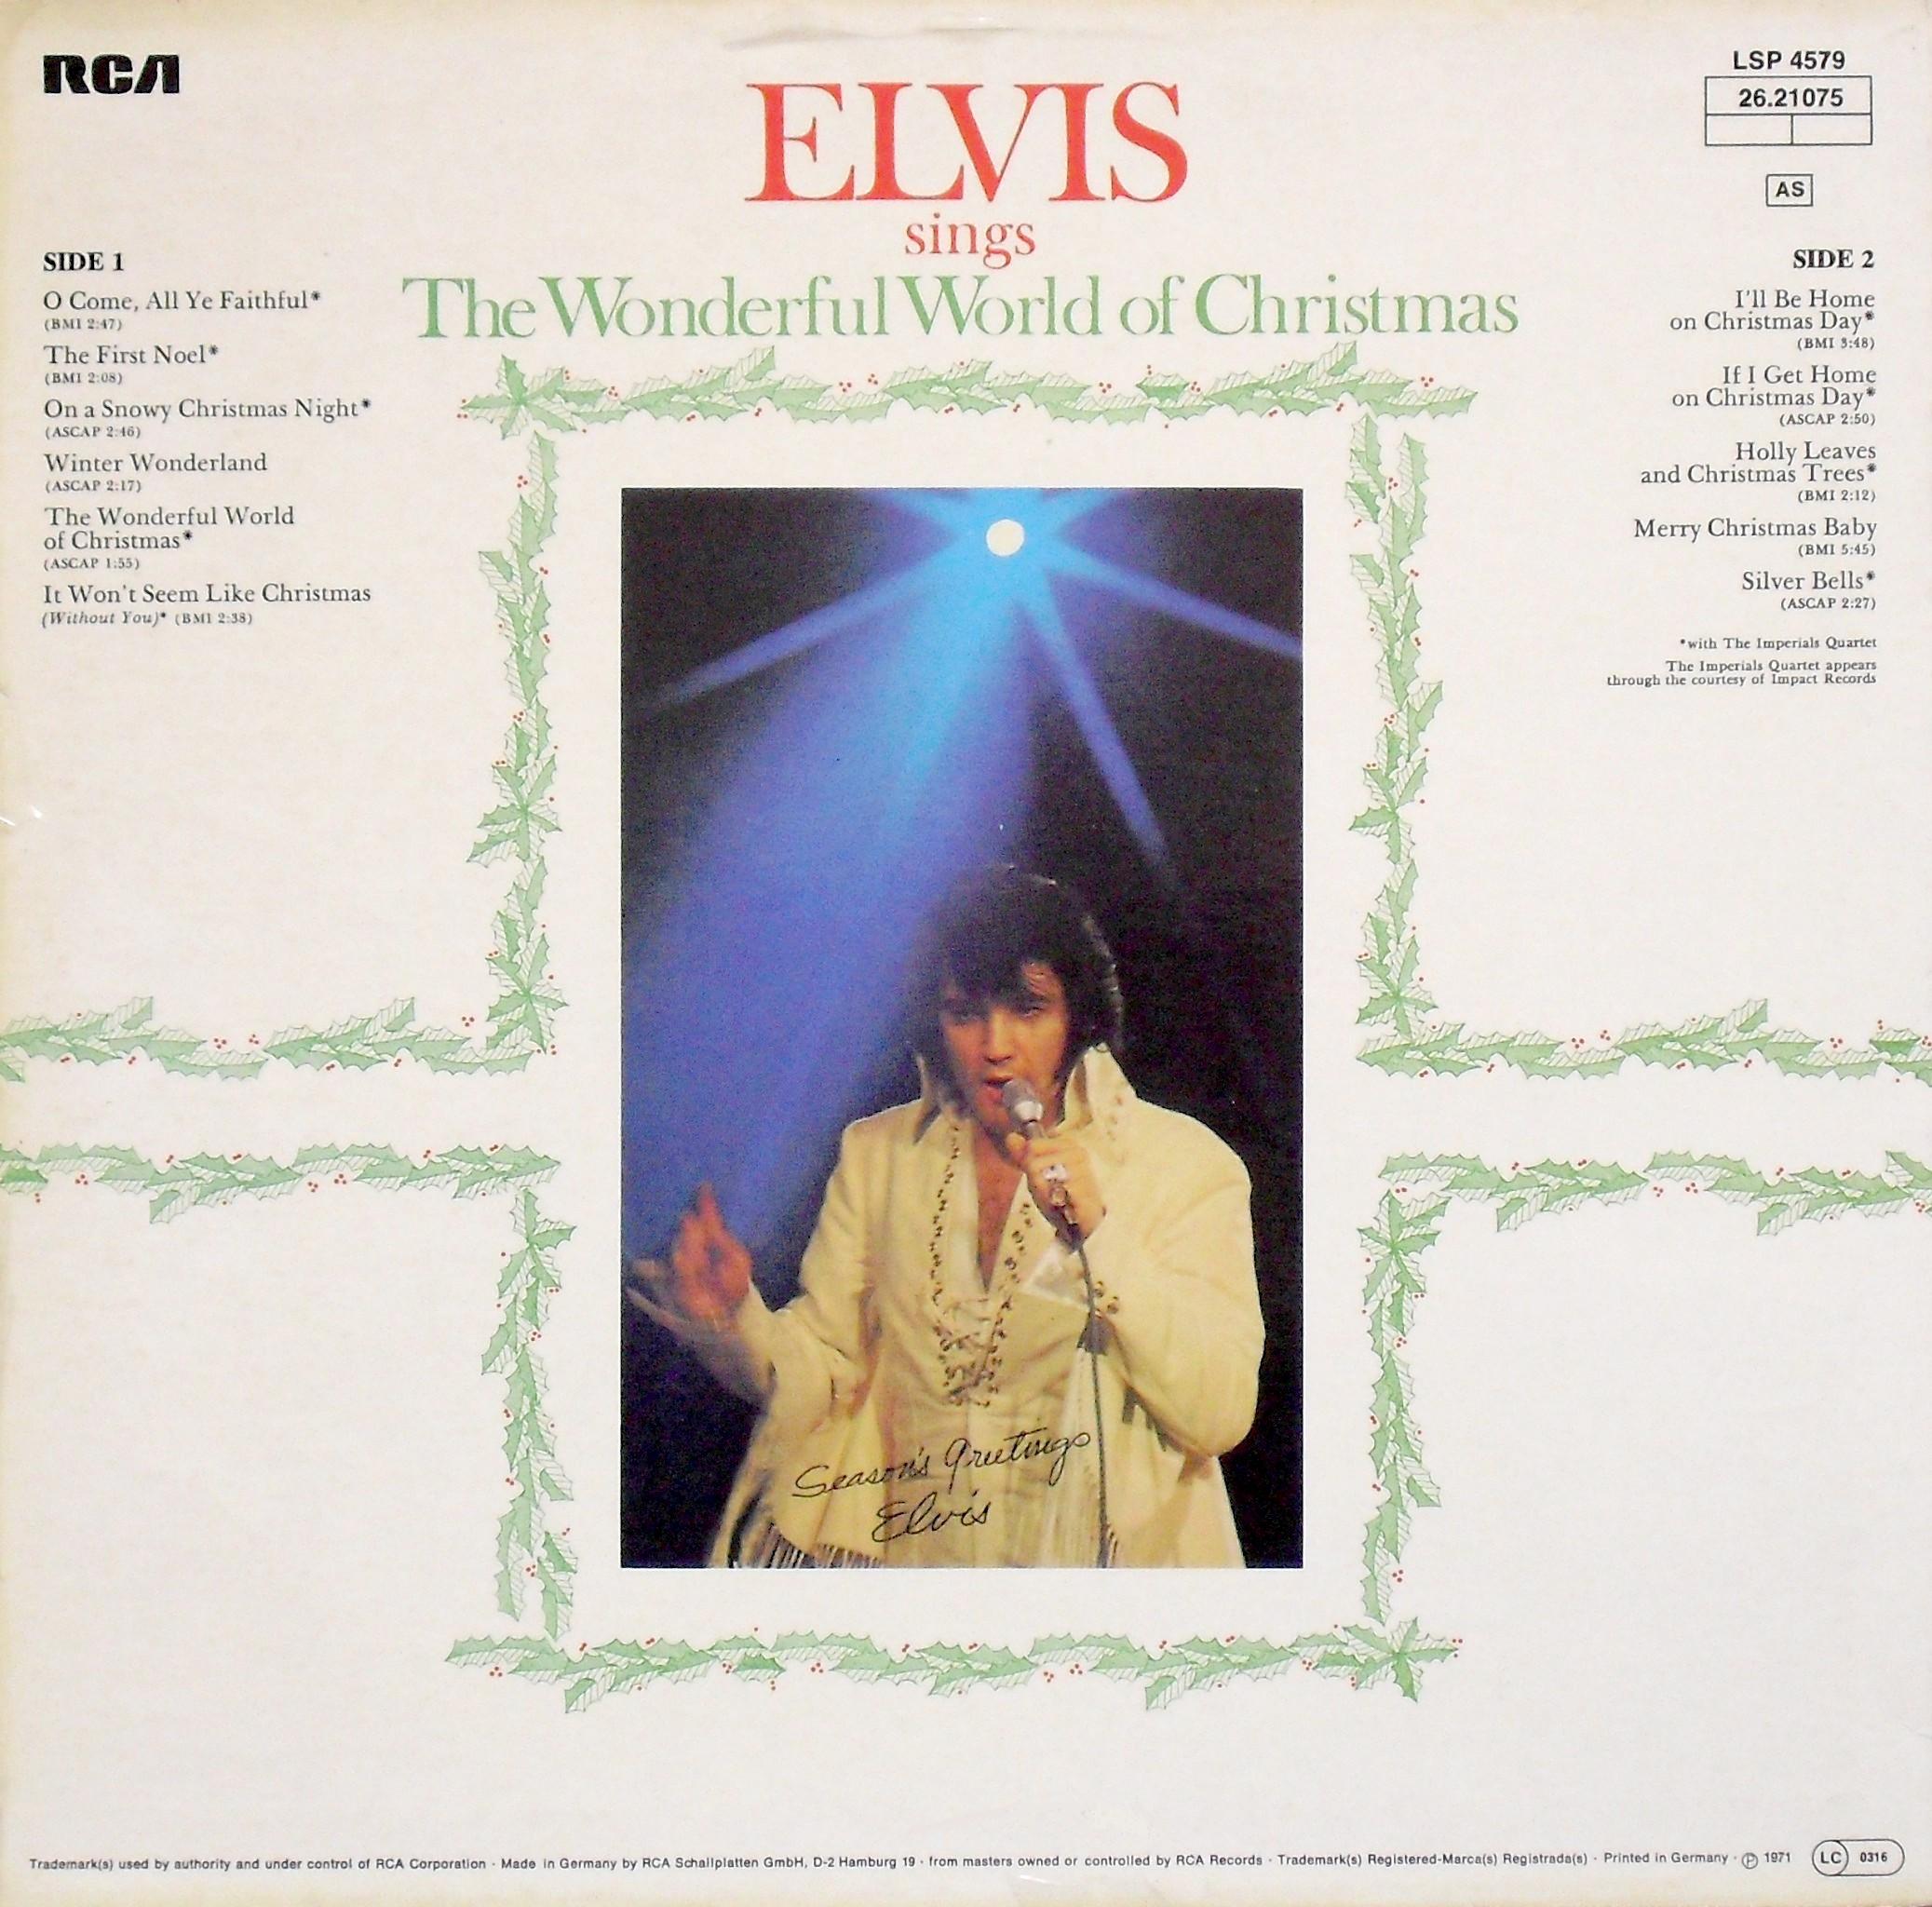 ELVIS SINGS THE WONDERFUL WORLD OF CHRISTMAS 02a2je0